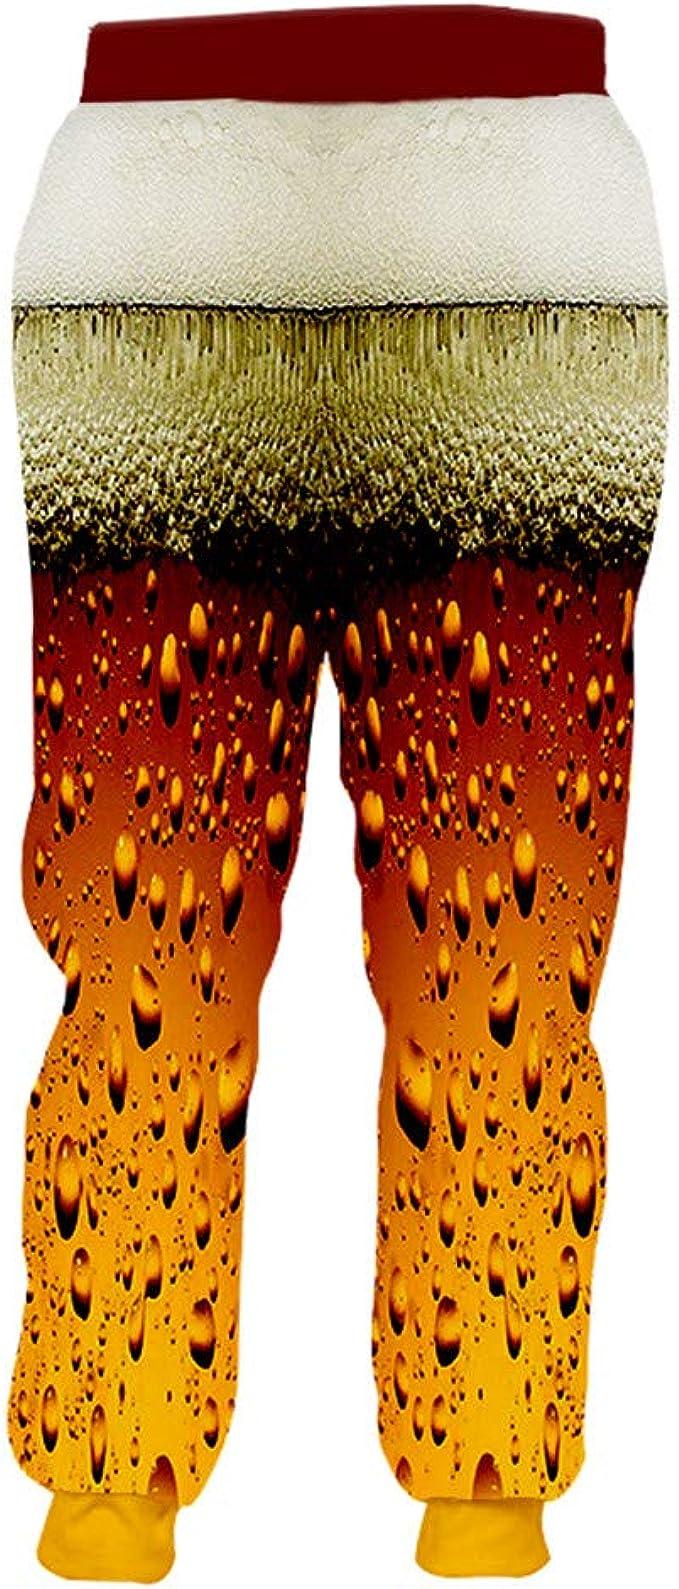 Pantalones chándal Masculinos Cintura elástica Gyms Impreso en 3D ...